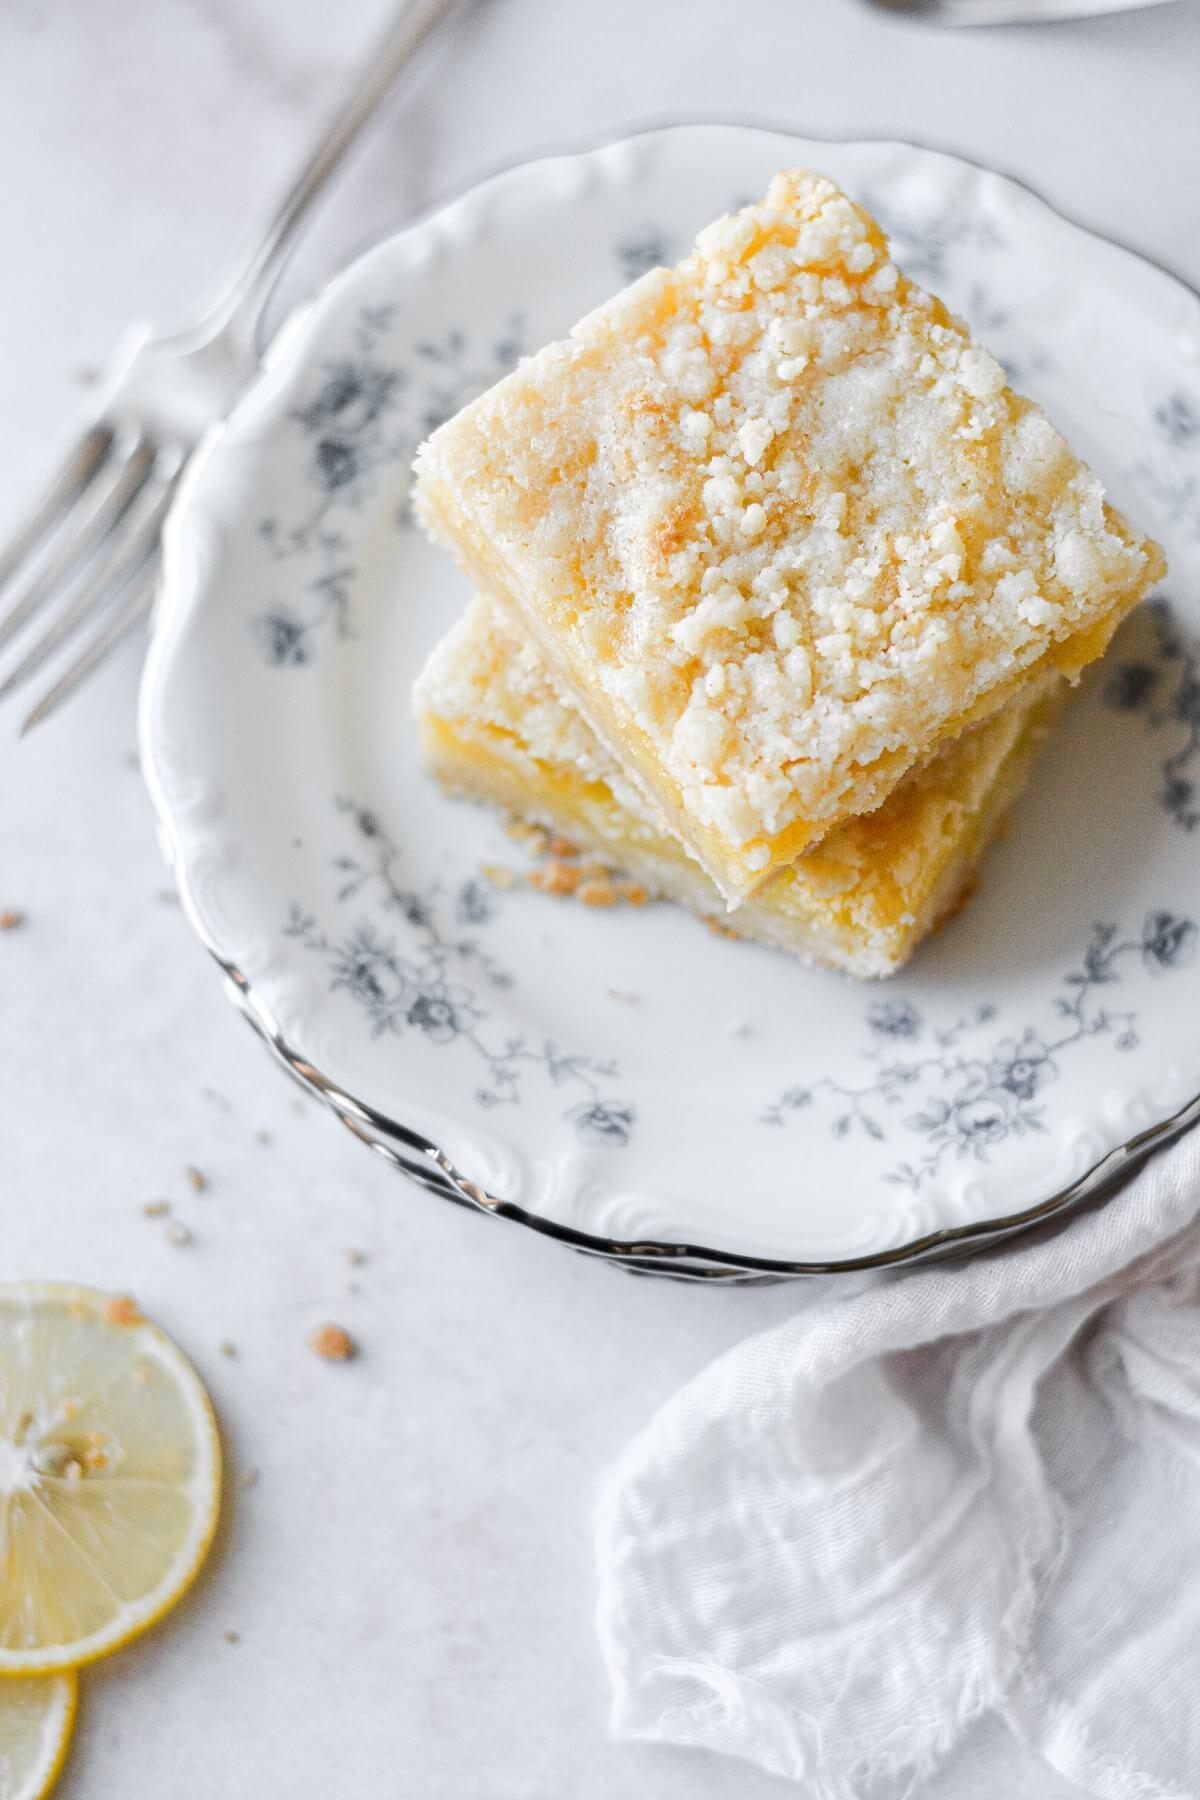 Lemon crumb bars, stacked on flowered plates.